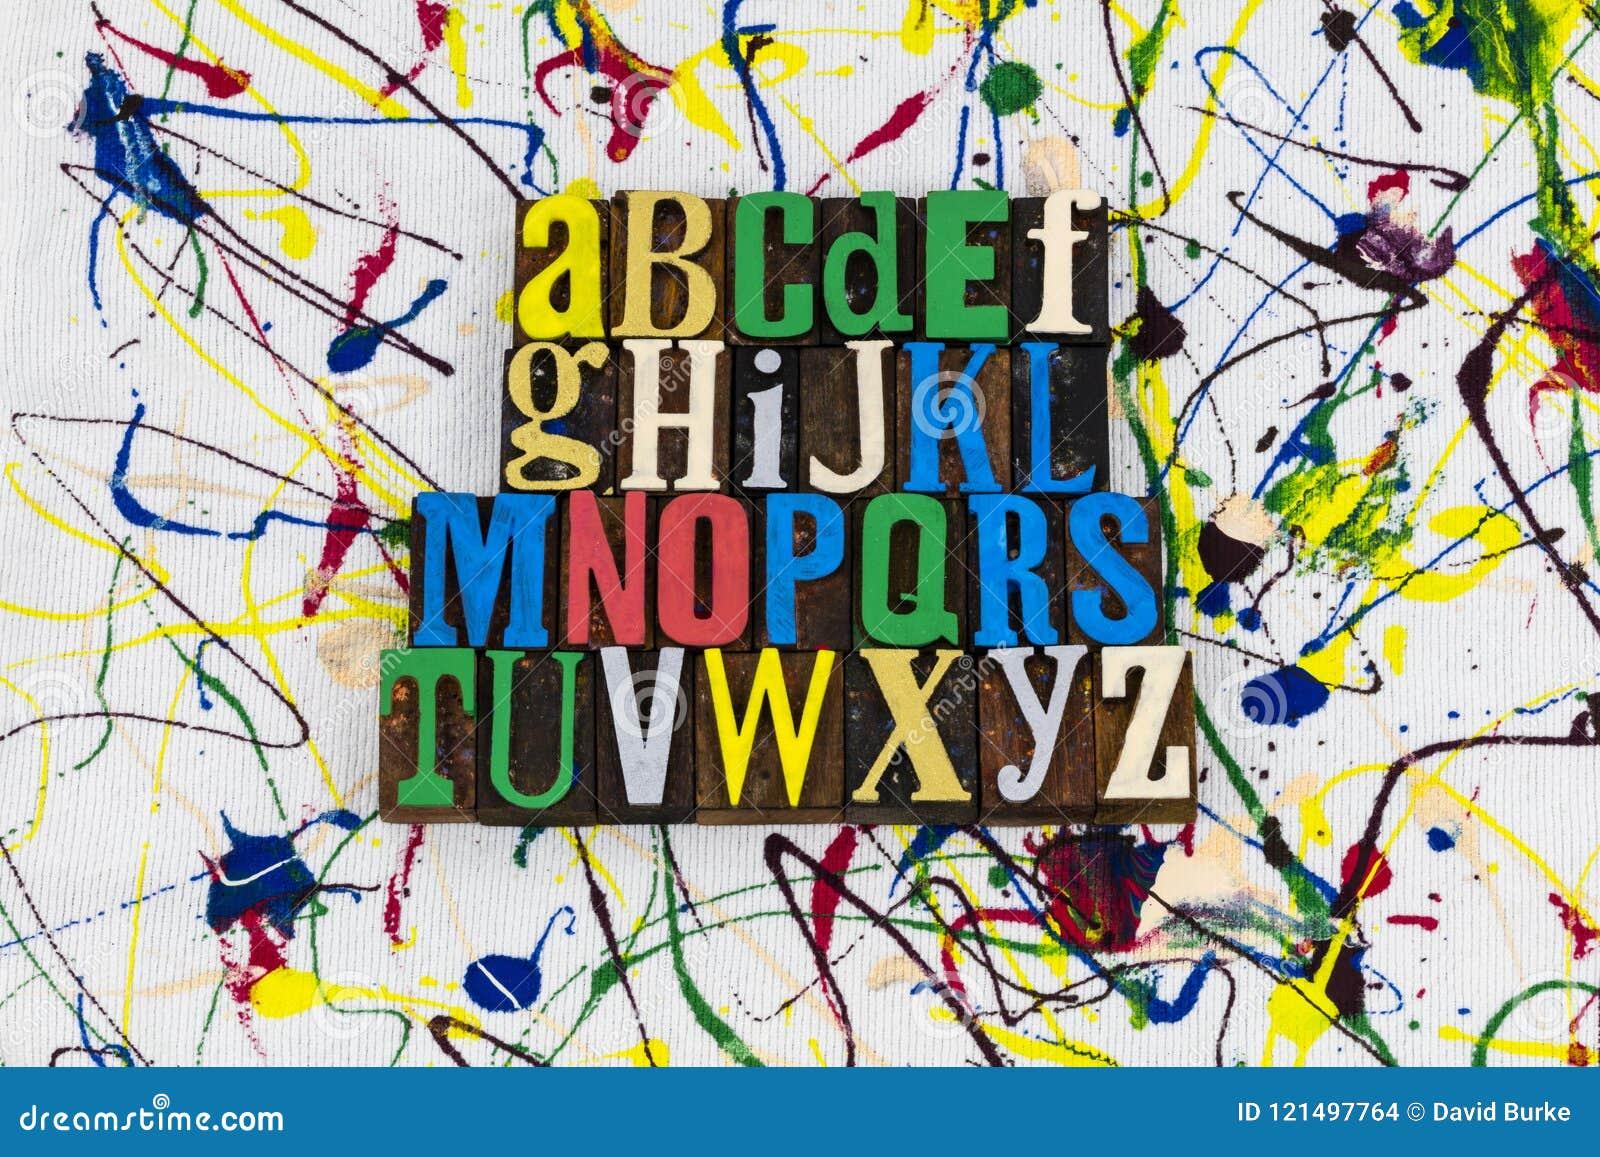 Alphabet spelling education abc letterpress